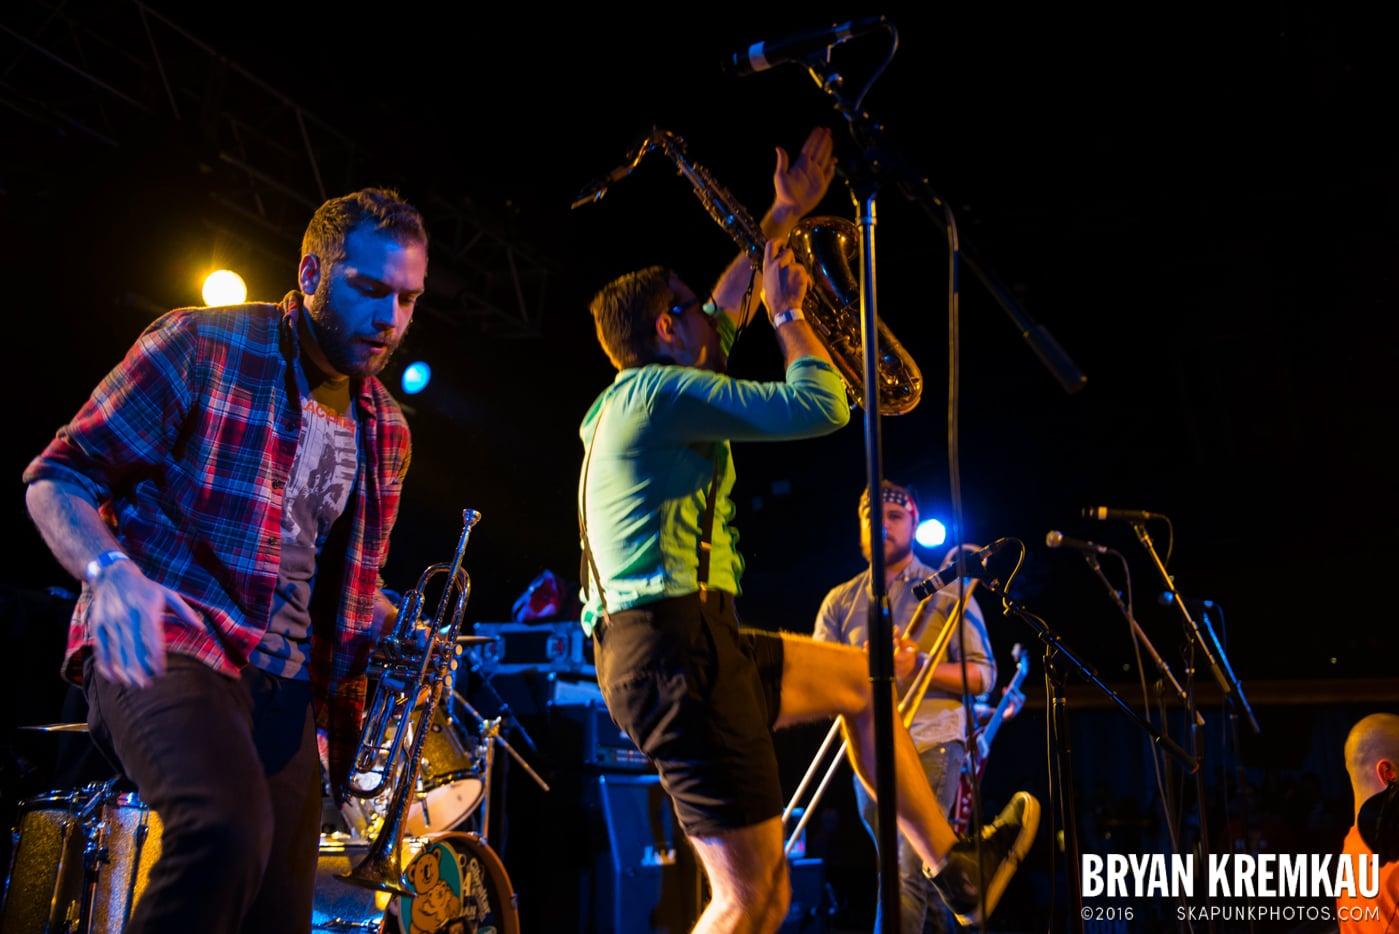 Backyard Superheroes @ Starland Ballroom, Sayreville, NJ - 11.9.13 (20)